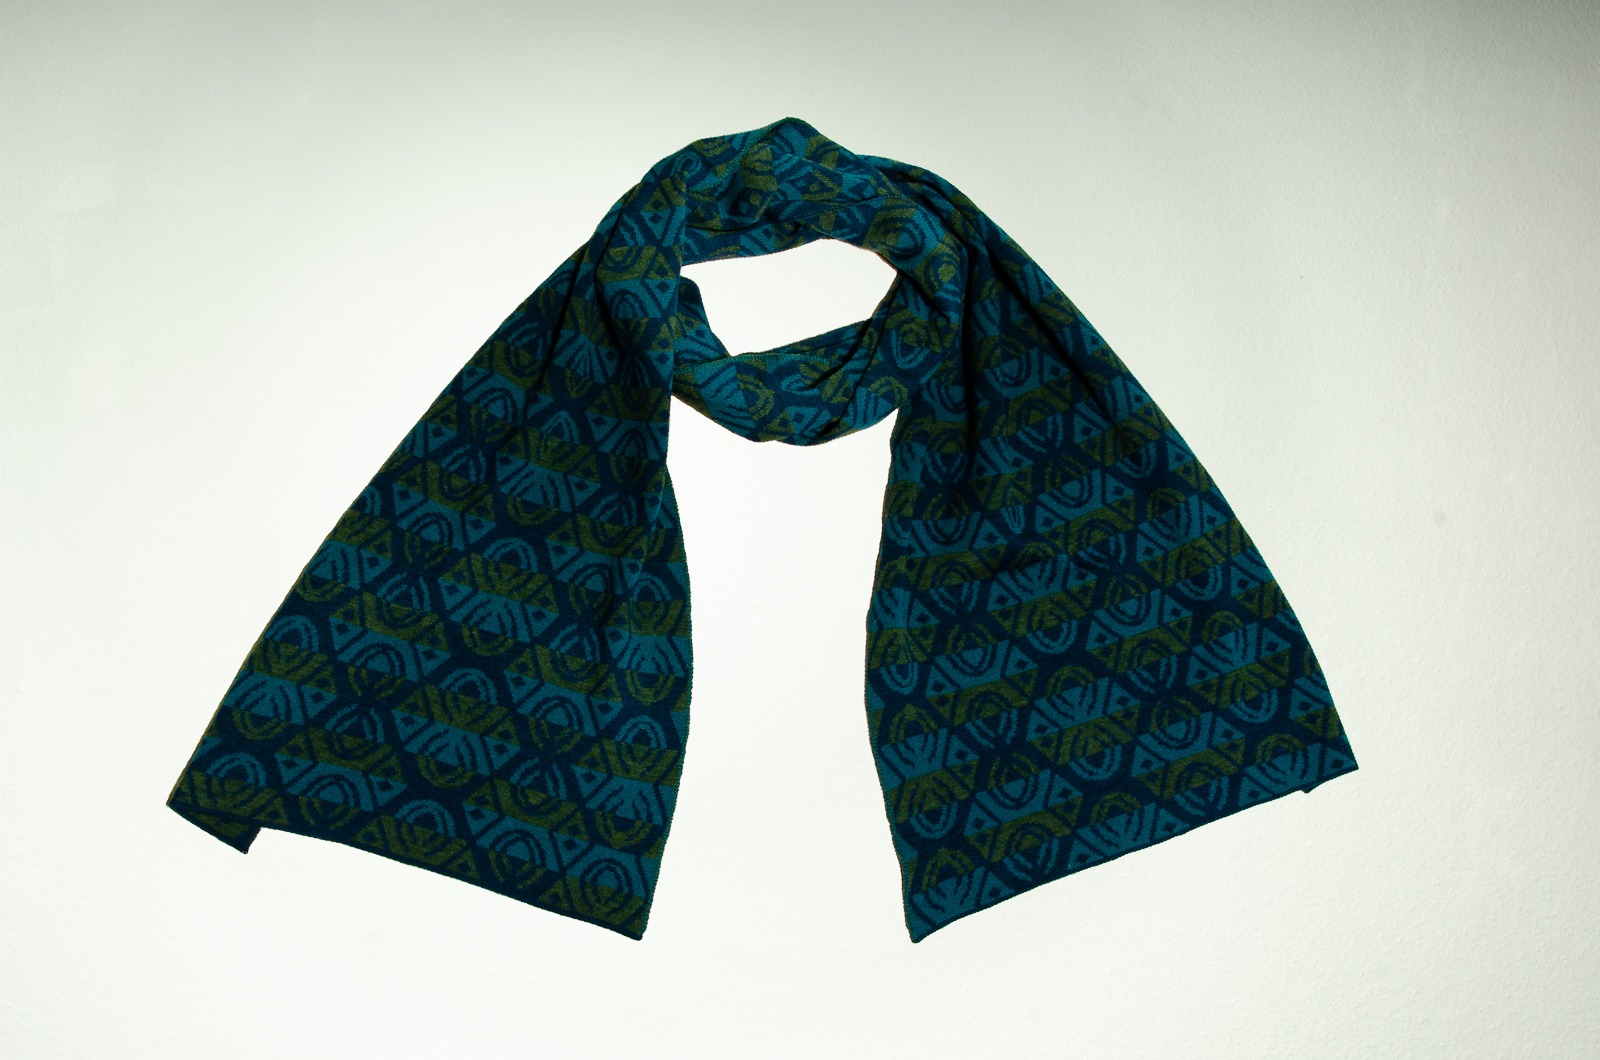 Merinoschal Lotus 3-farbig 3